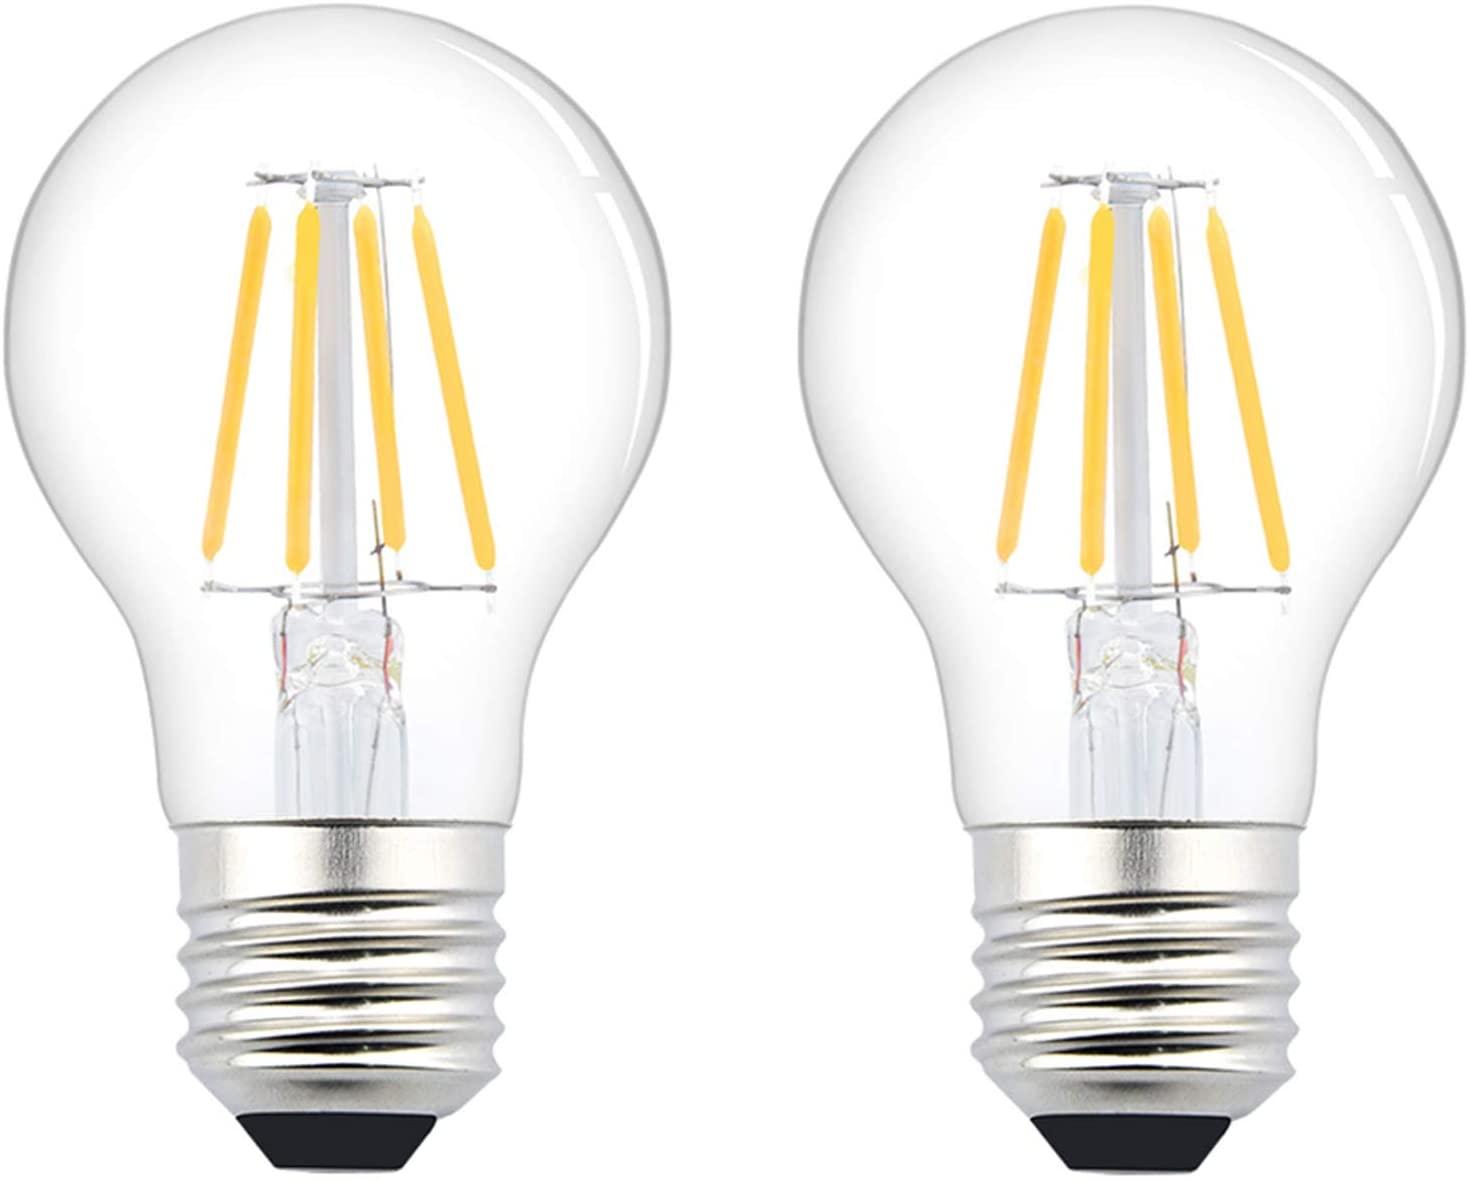 Luxvista 12V-36V E26 LED Bulb - 4W A19 Edison Filament LED Light Bulb E26 Medium Base Lamp Low Voltage Battery System RV Marine Boat Solar Train Lighting Warm White 2700K (2-Pack)